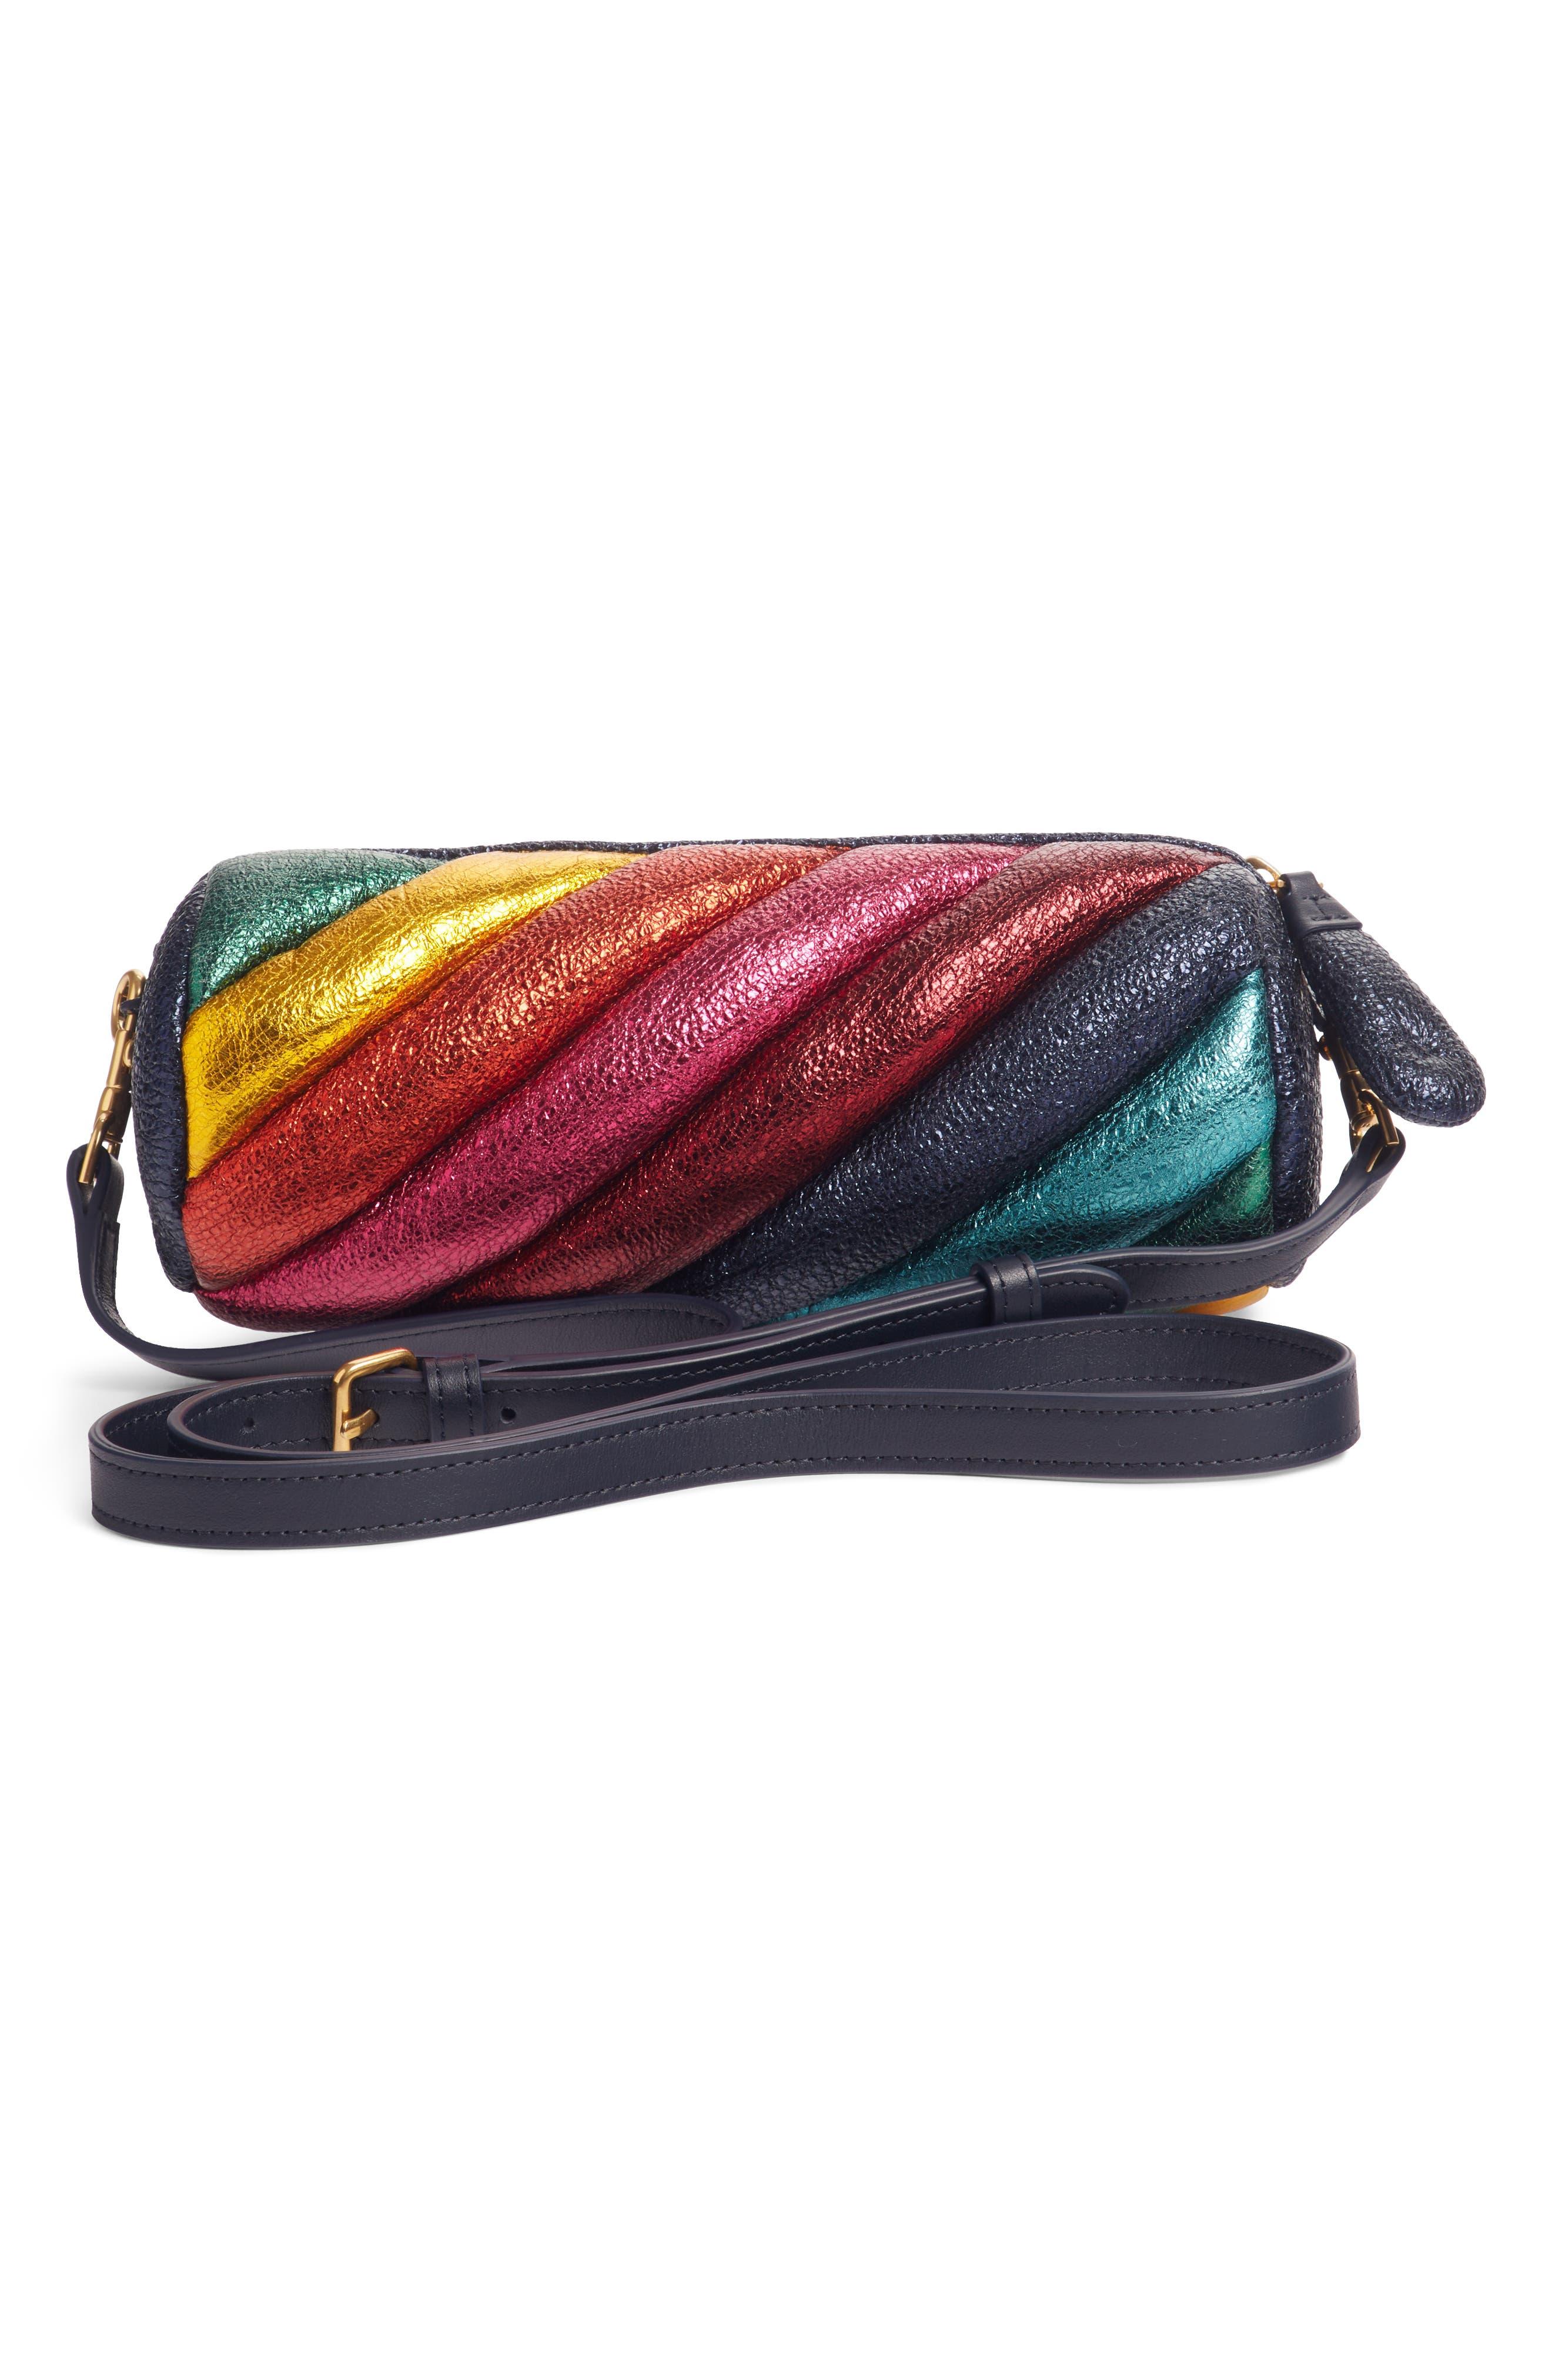 Marshmallow Twist Metallic Leather Crossbody Bag,                             Alternate thumbnail 2, color,                             BLACK MULTI